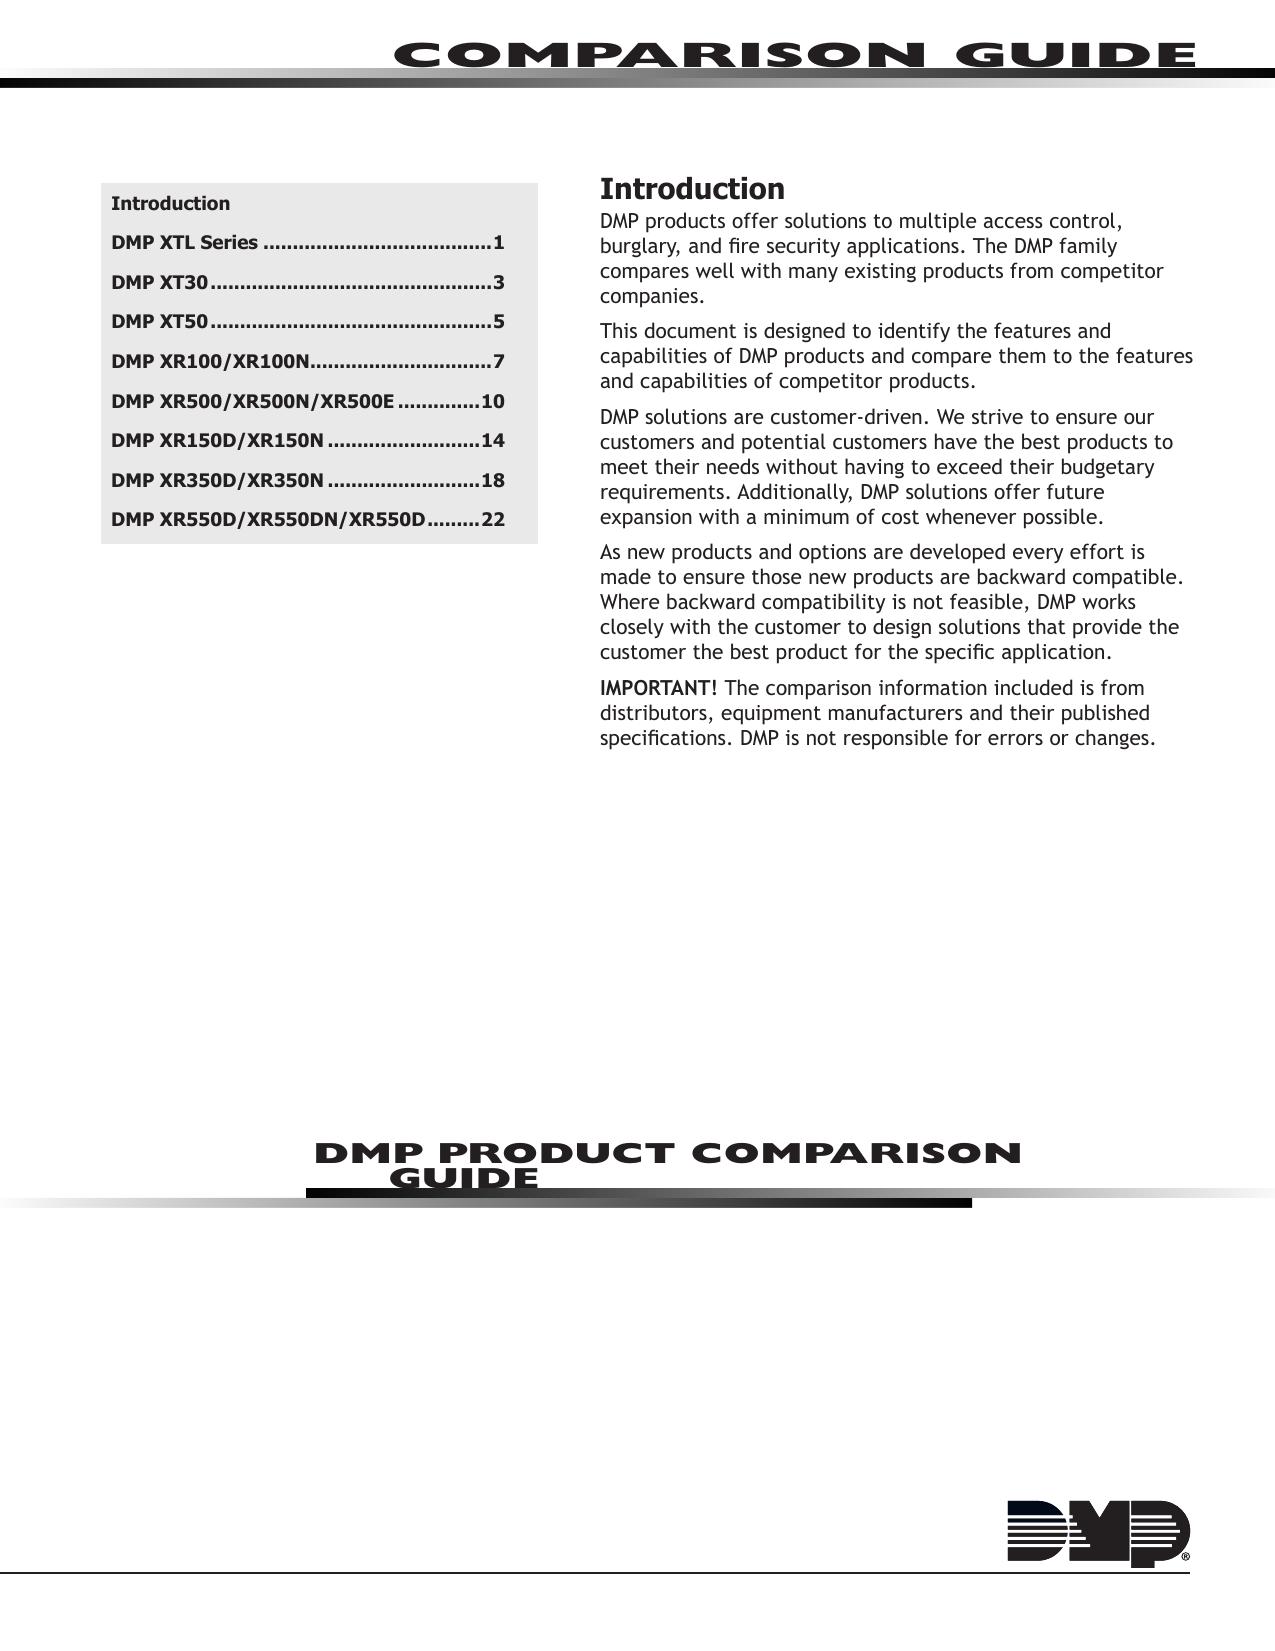 comparison guide dmp com digital monitoring products manualzz com rh manualzz com dmp xr 500 programming manual DMP XR 500 User's Guide